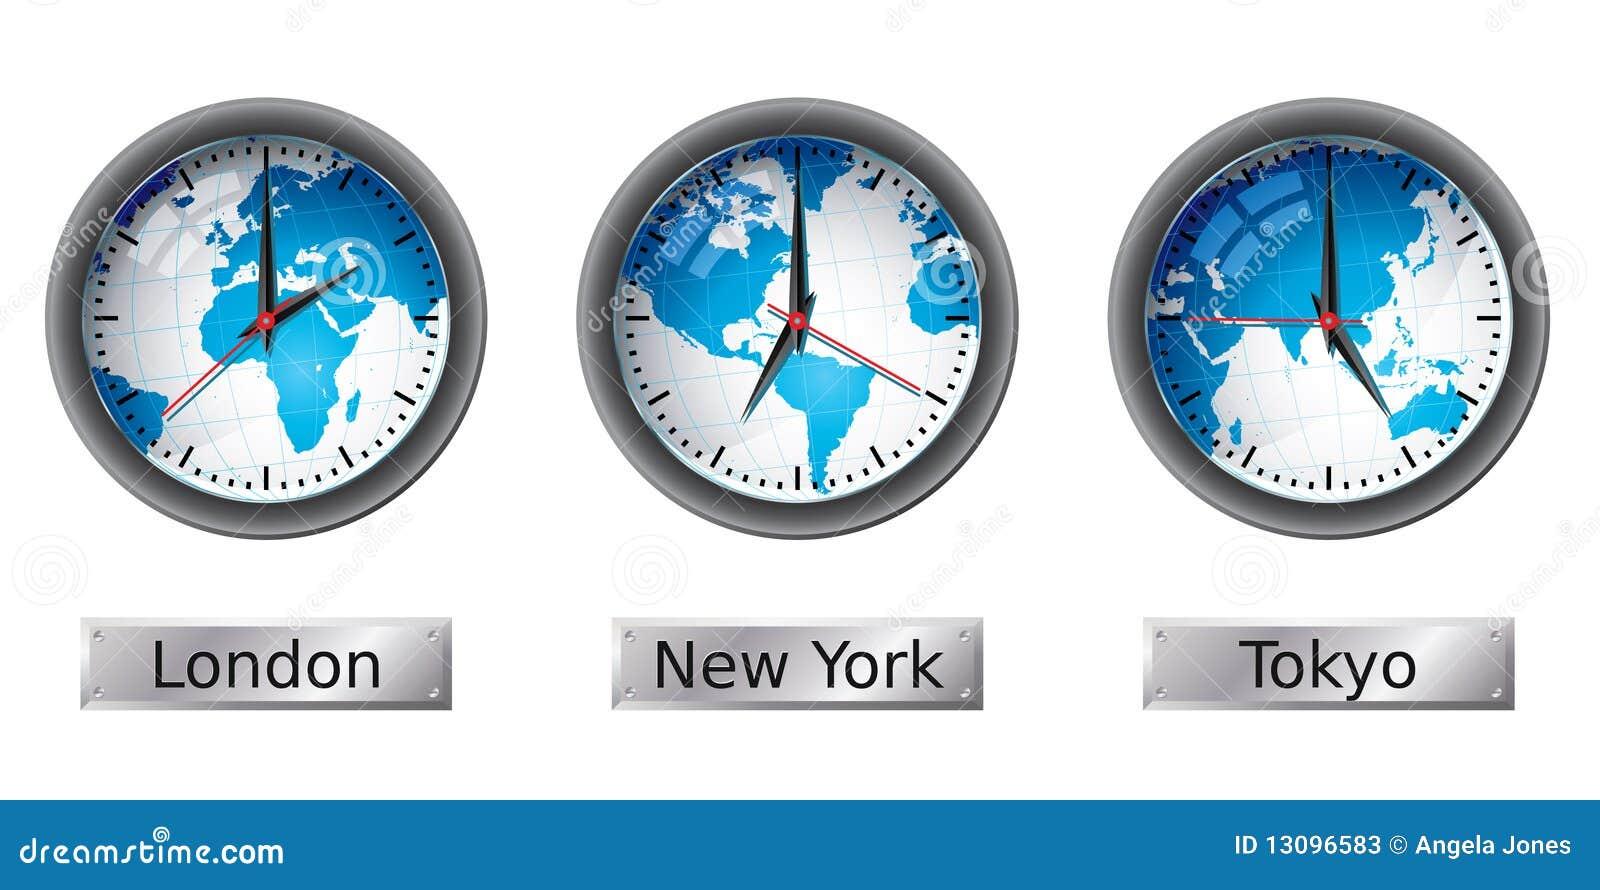 World Map Time Zone Clocks Stock Photos Image 13096583